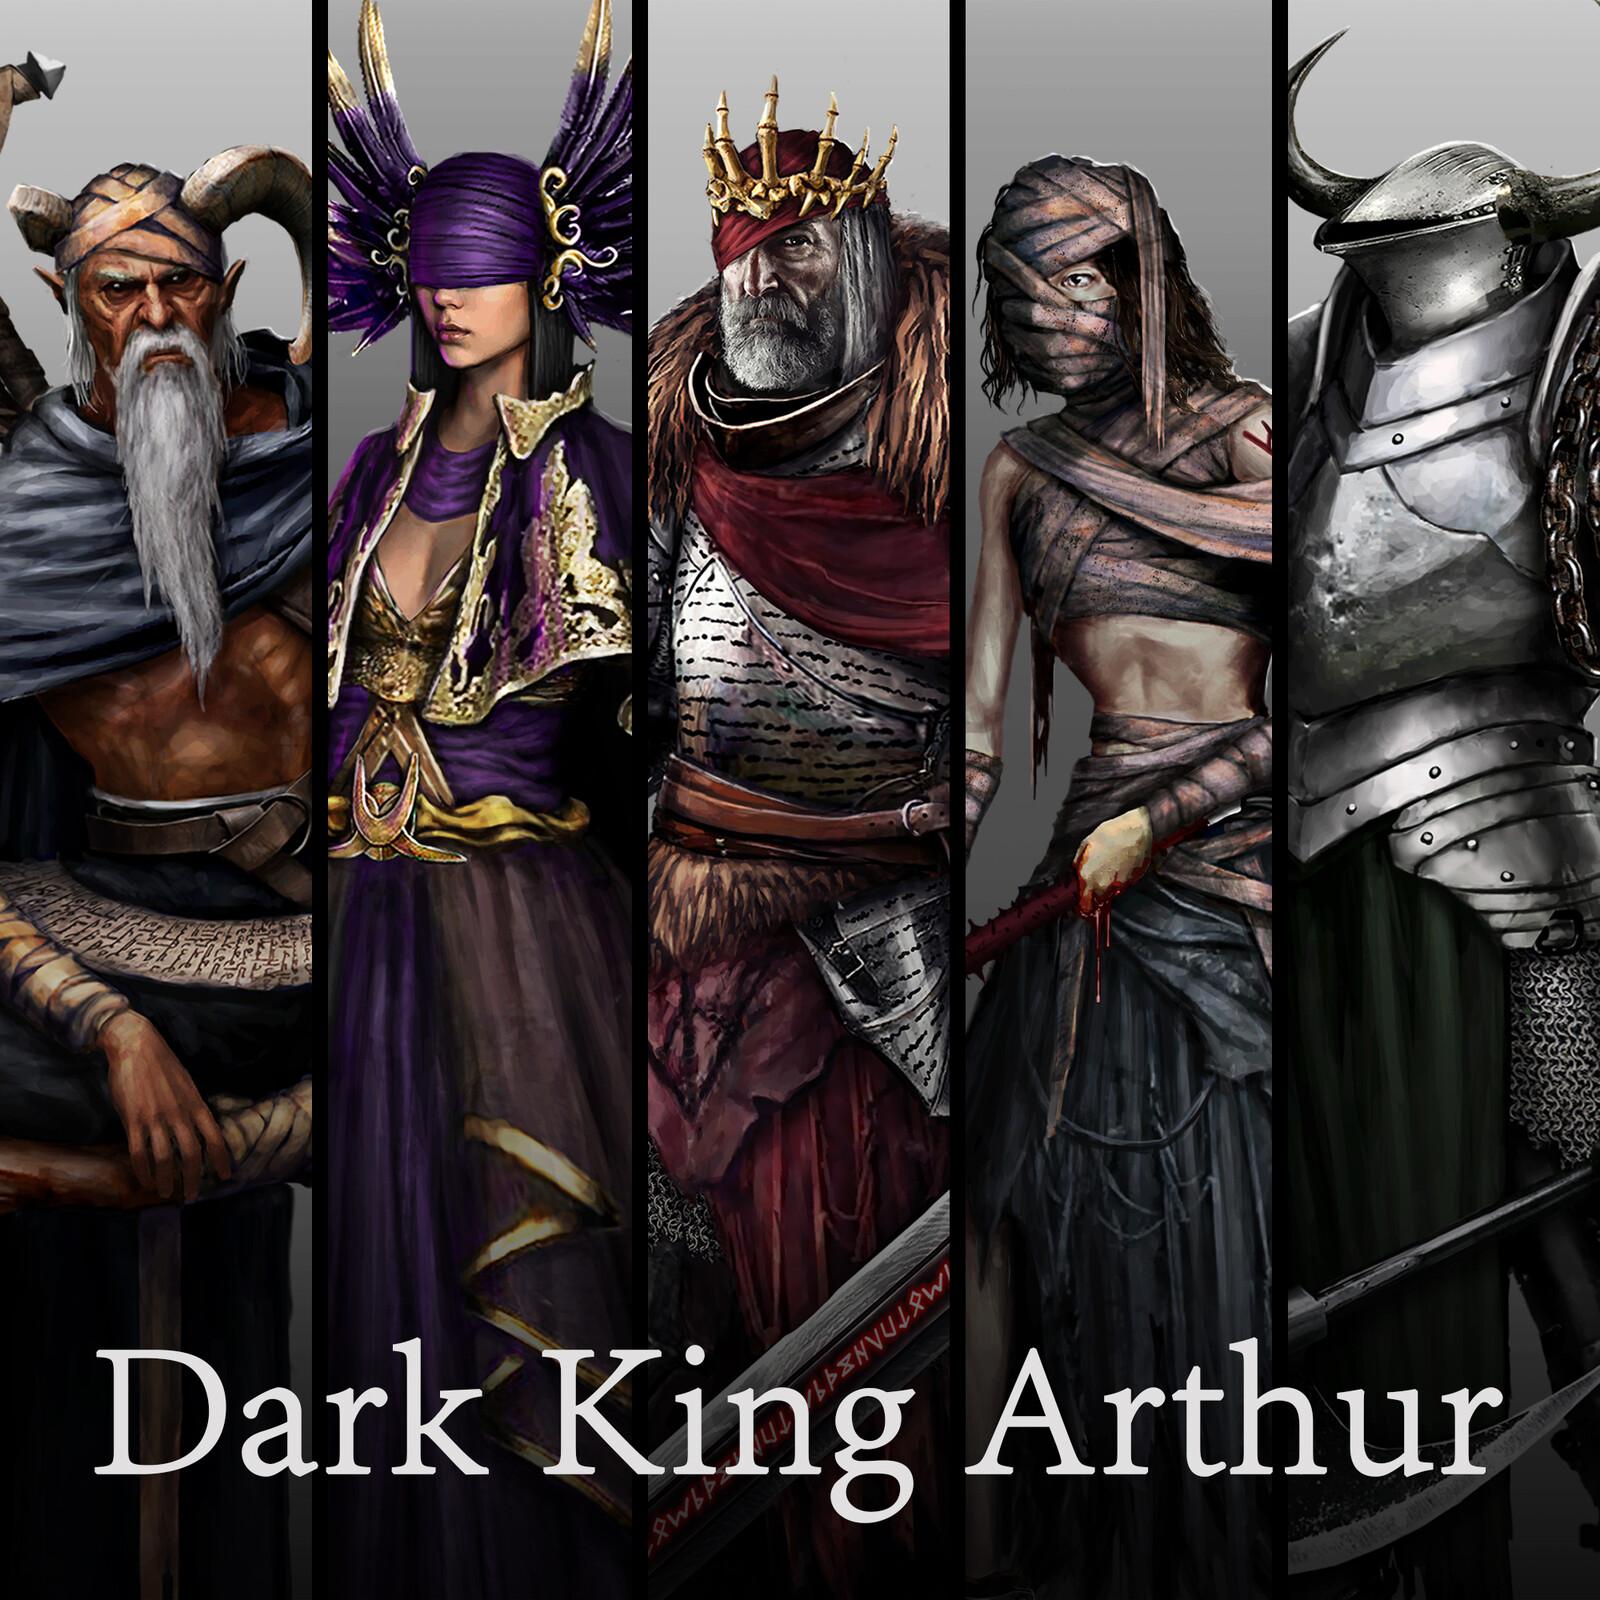 King Arthur challenge